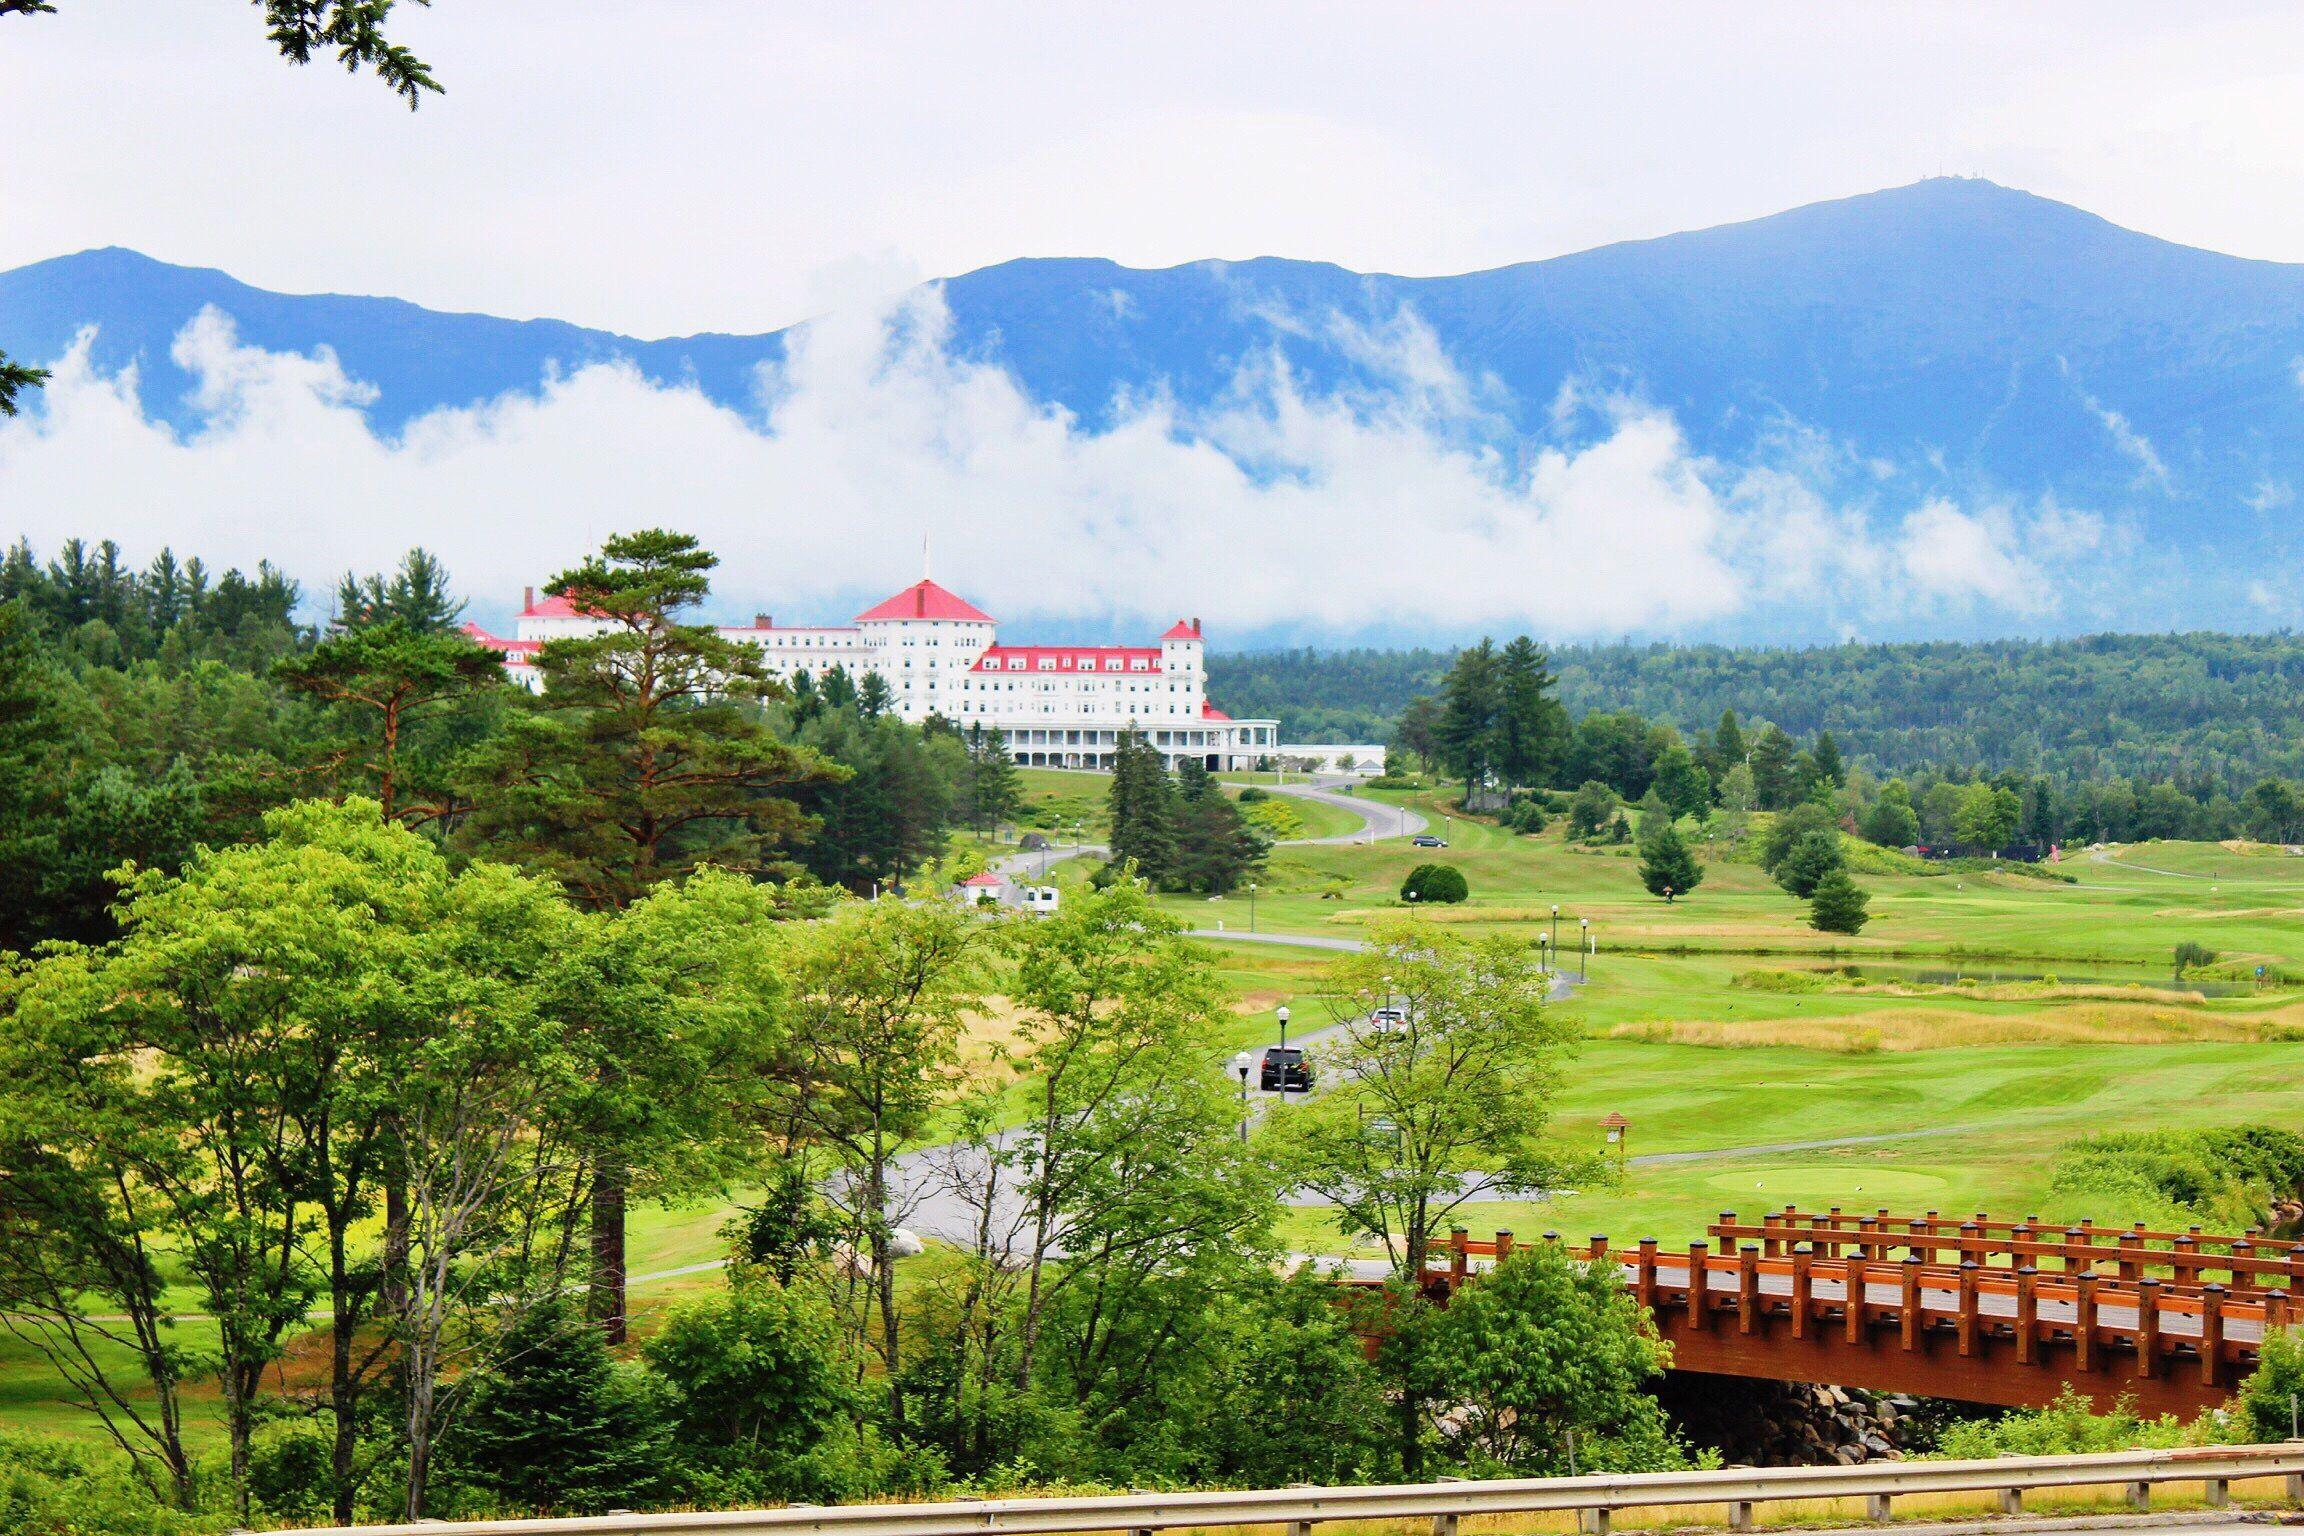 Omni Mount Washington Resort Against Mountains In Foggy Weather